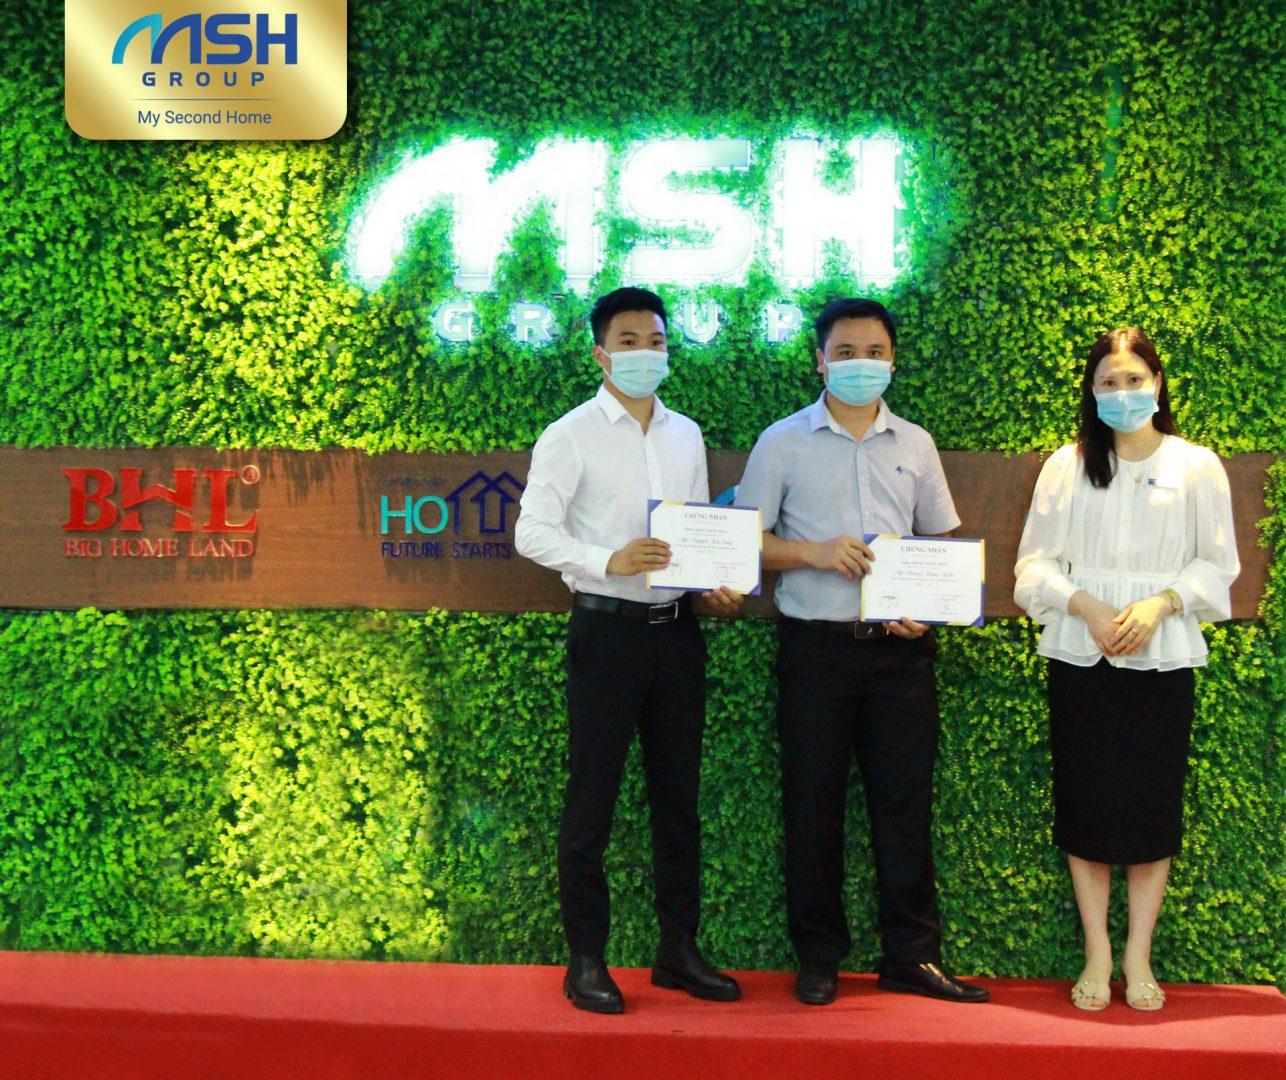 MSH GROUP KICK OFF